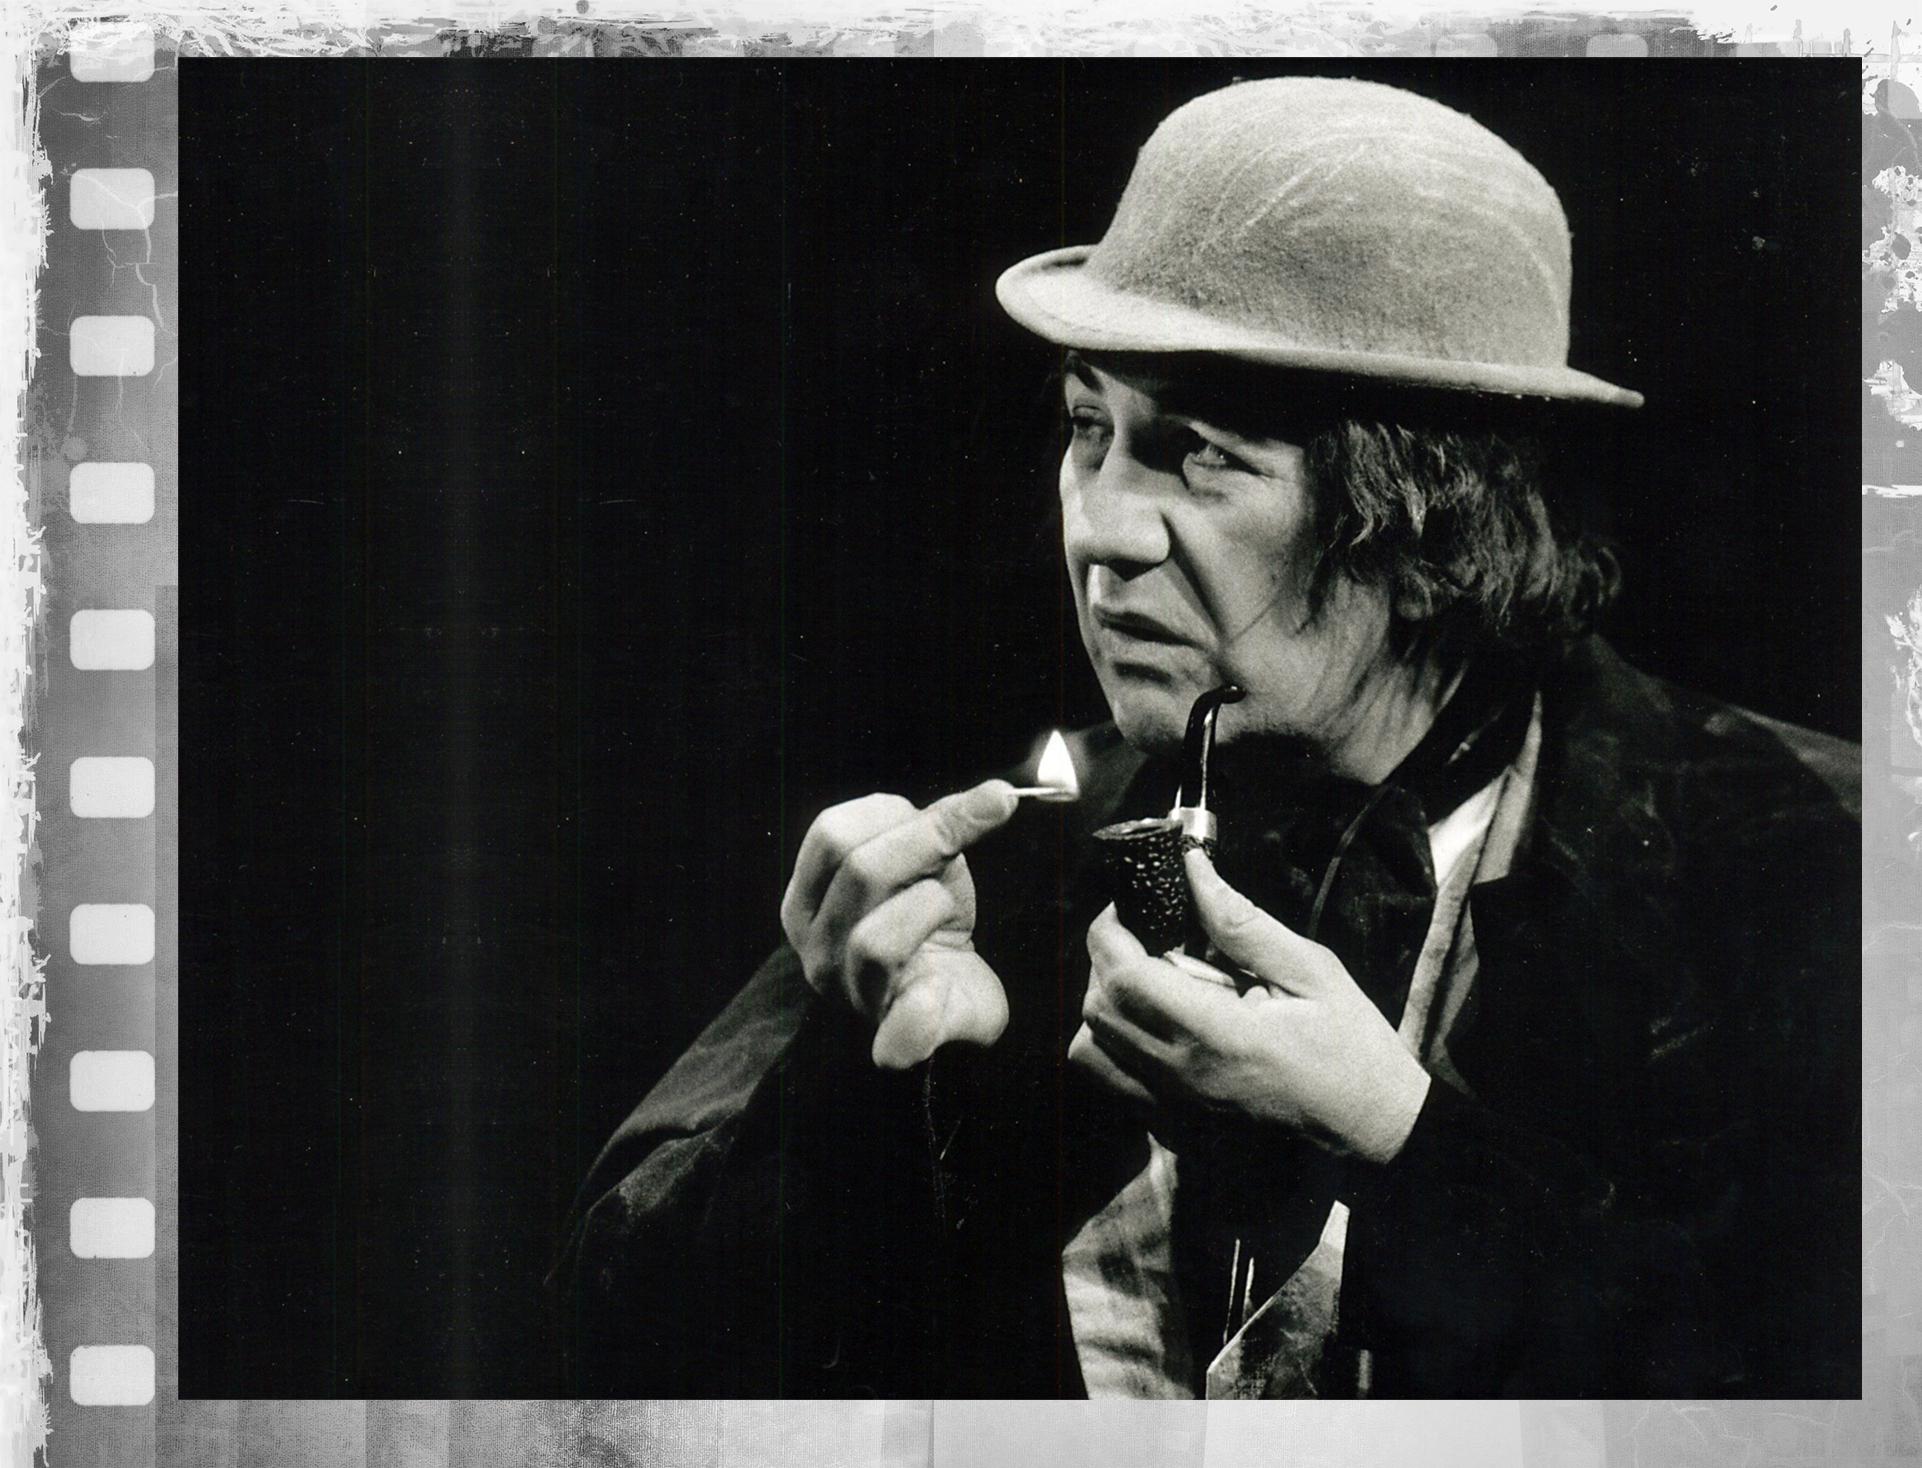 210. Kapp & Peterson in Samuel Beckett's Waiting for Godot